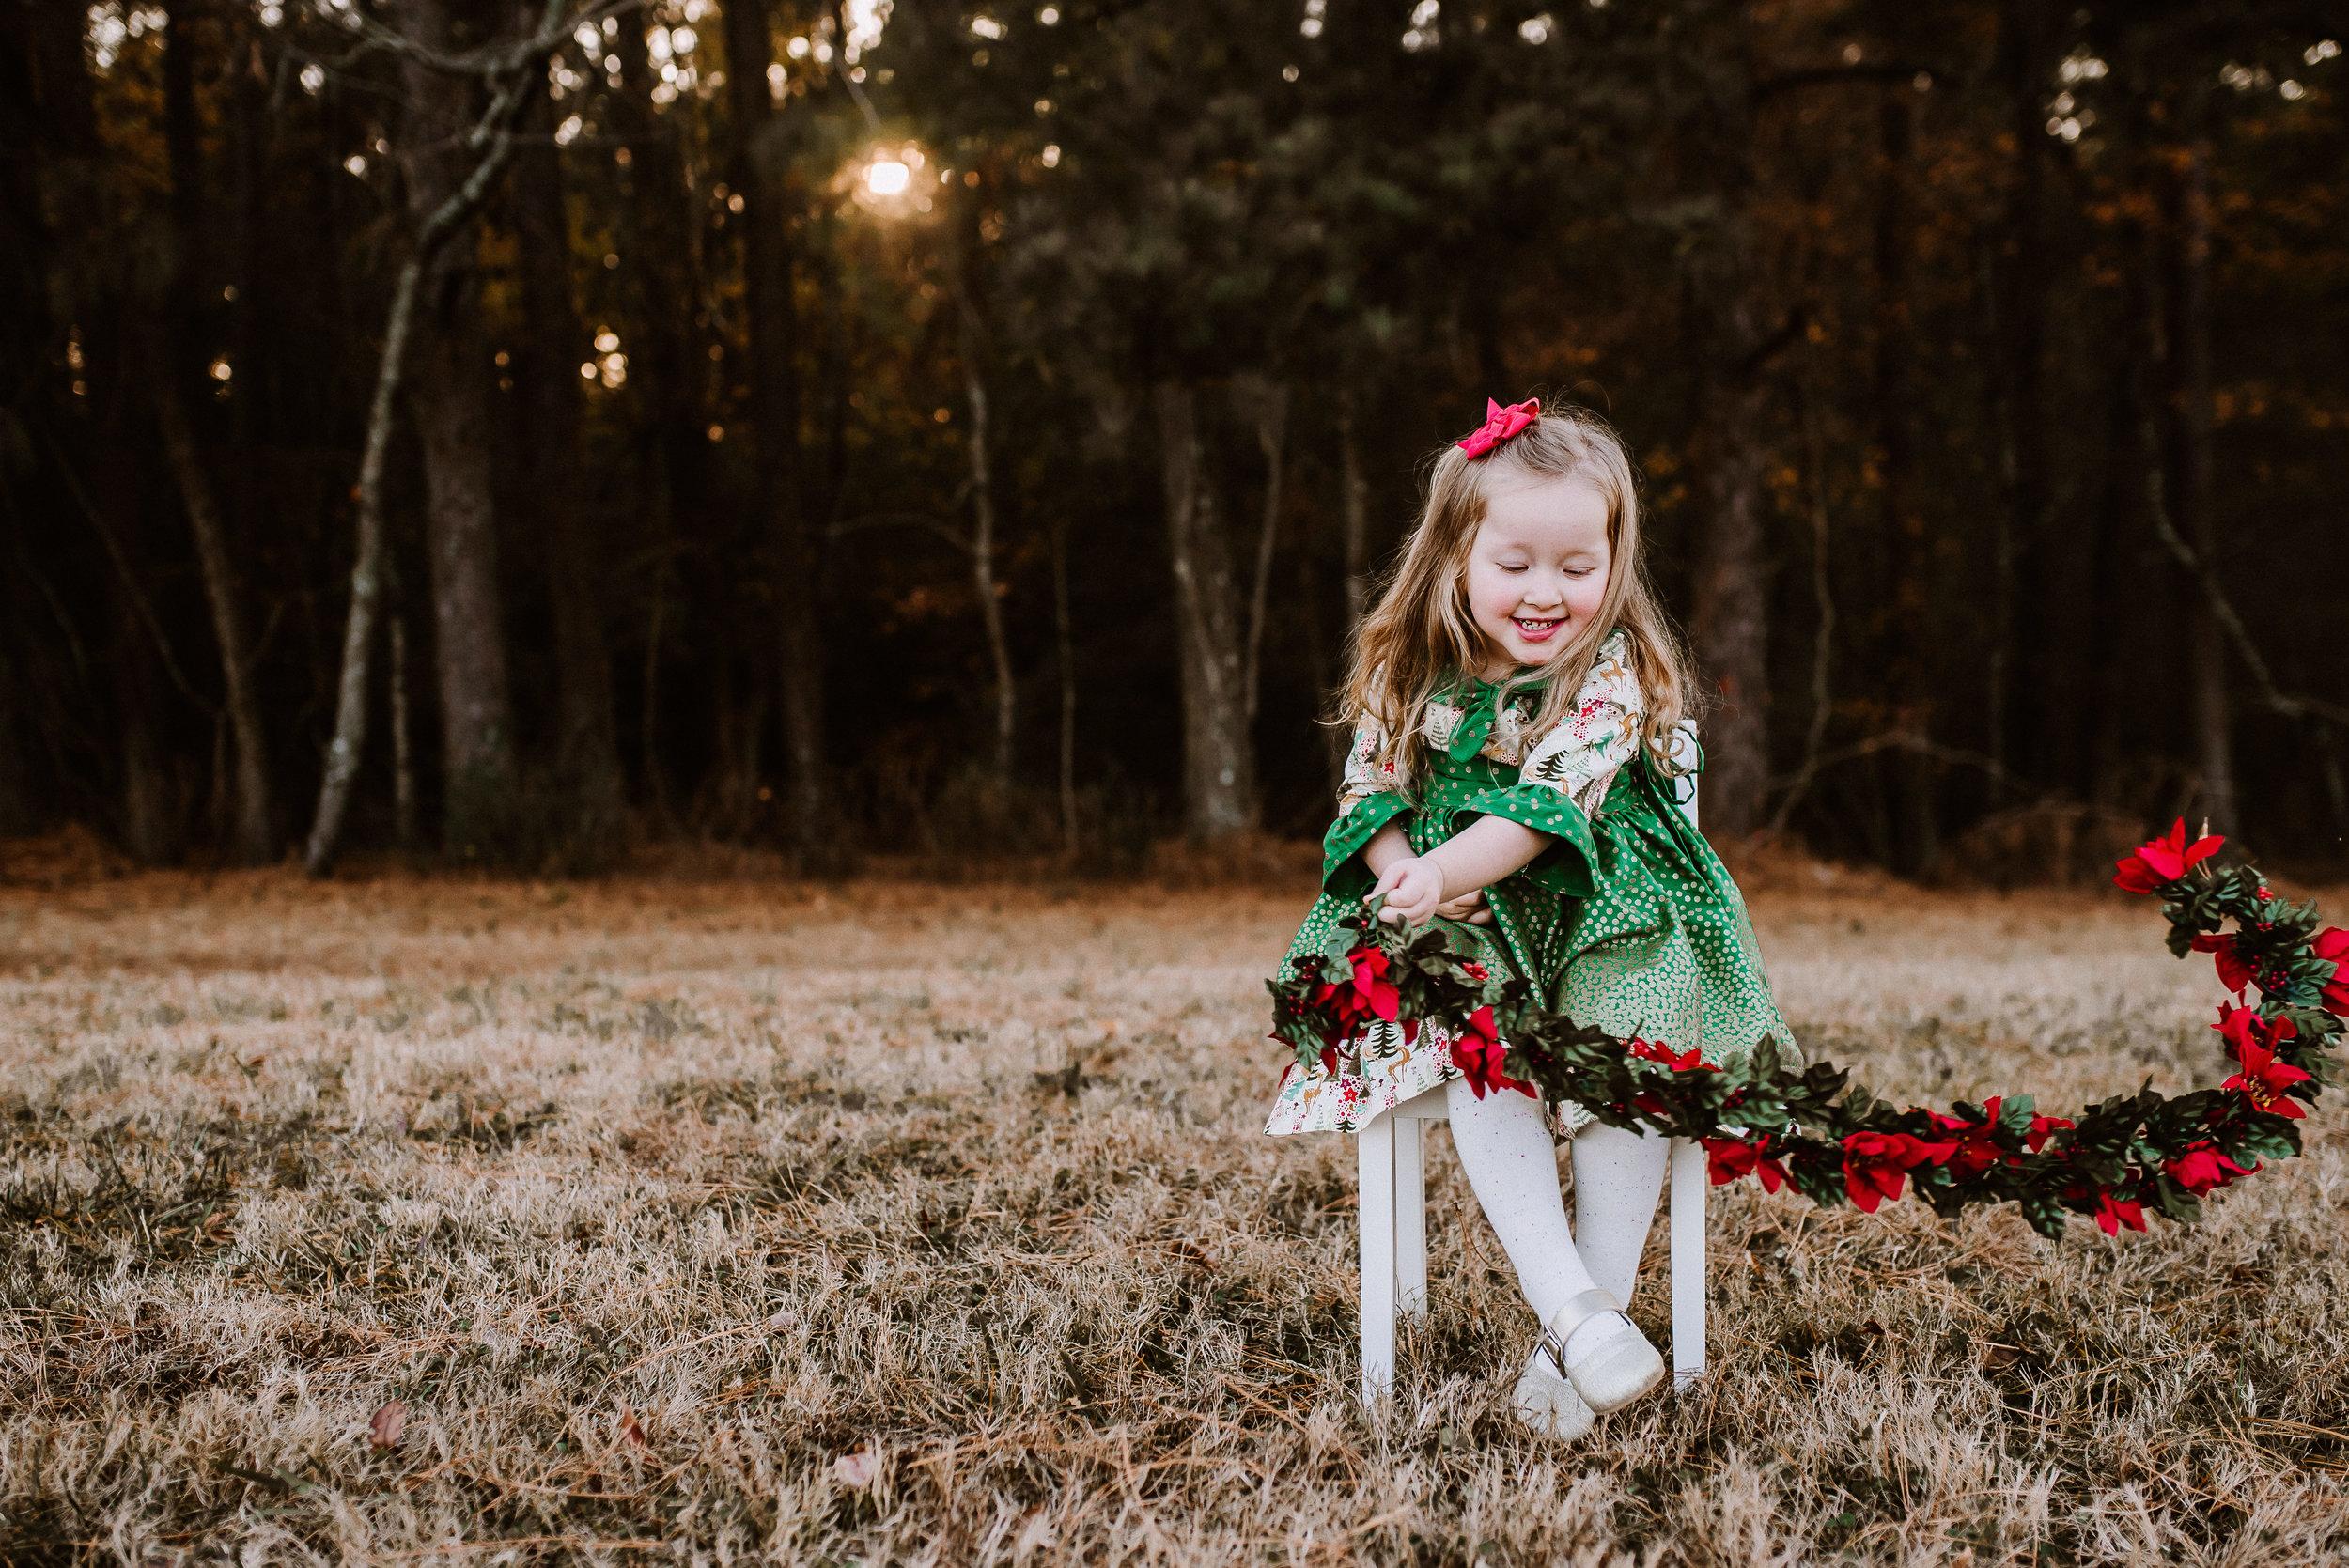 Maggie_Christmas_Ashley-Benham-Photography-19.jpg